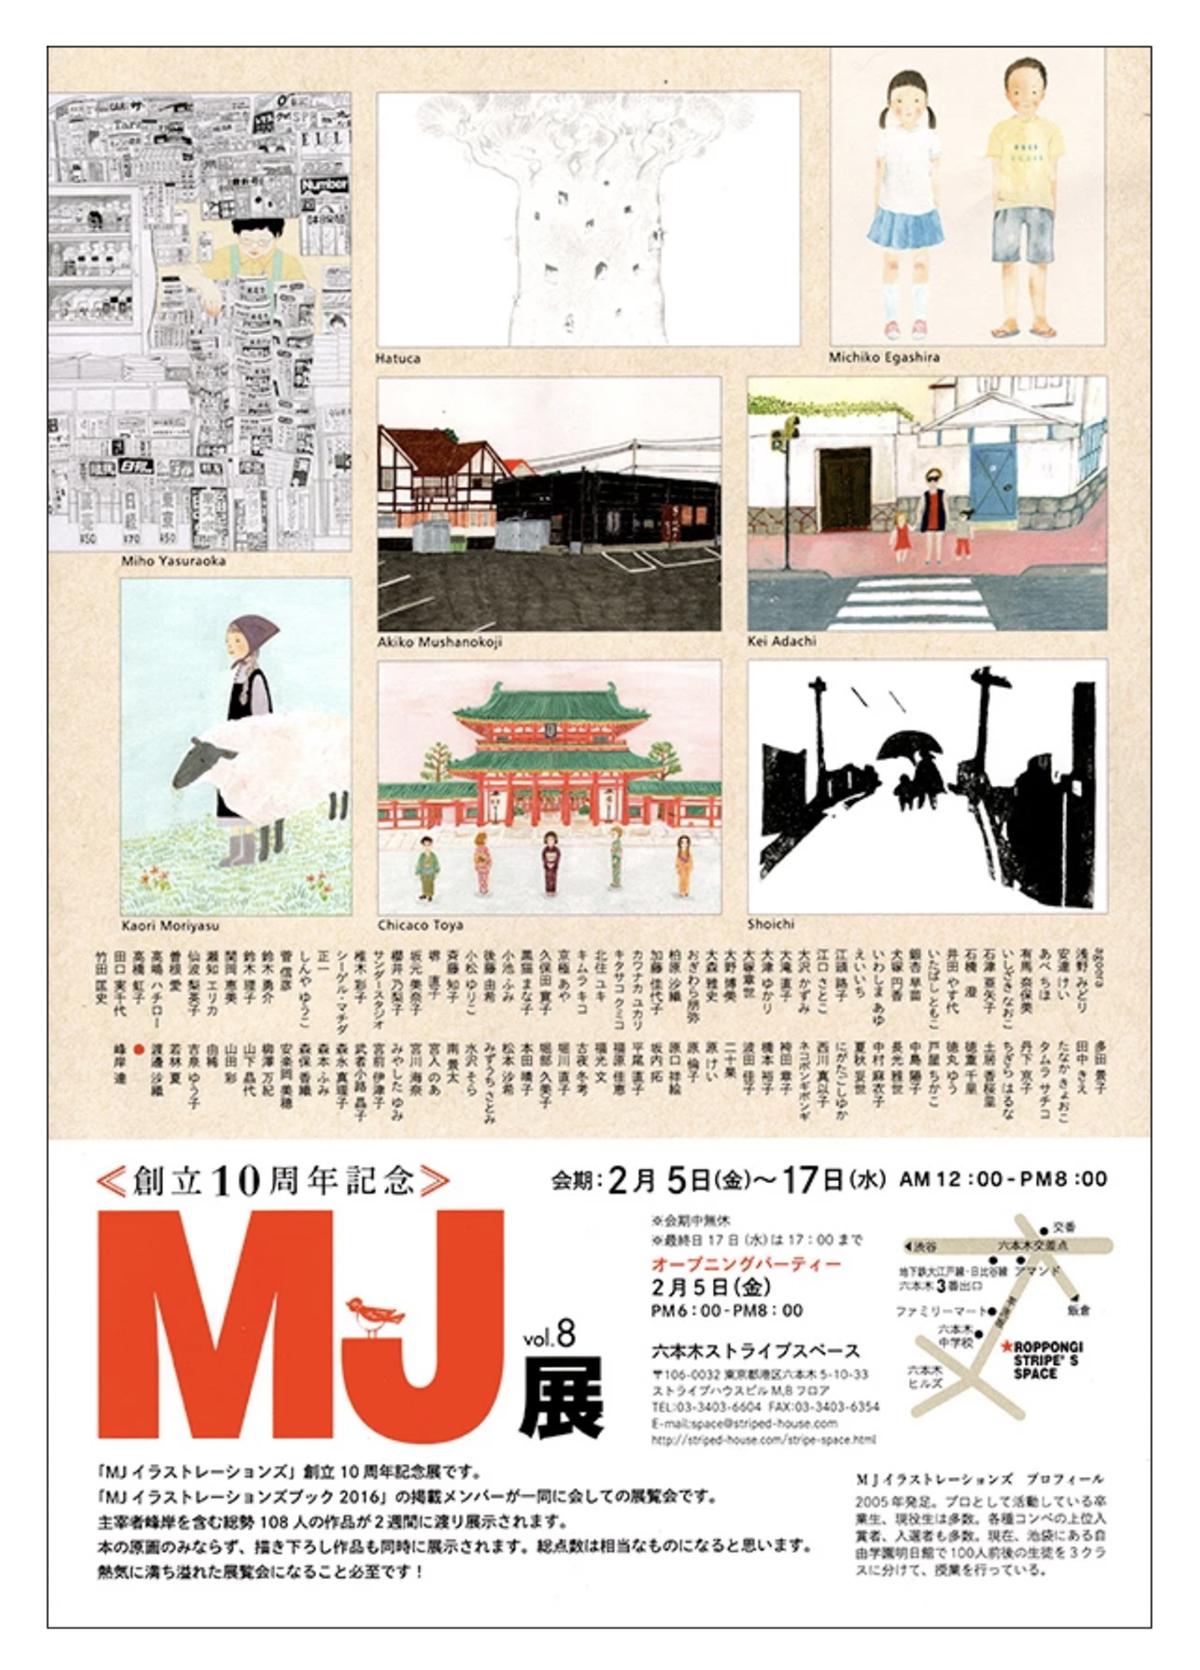 MJ展 vol.8 のお知らせ